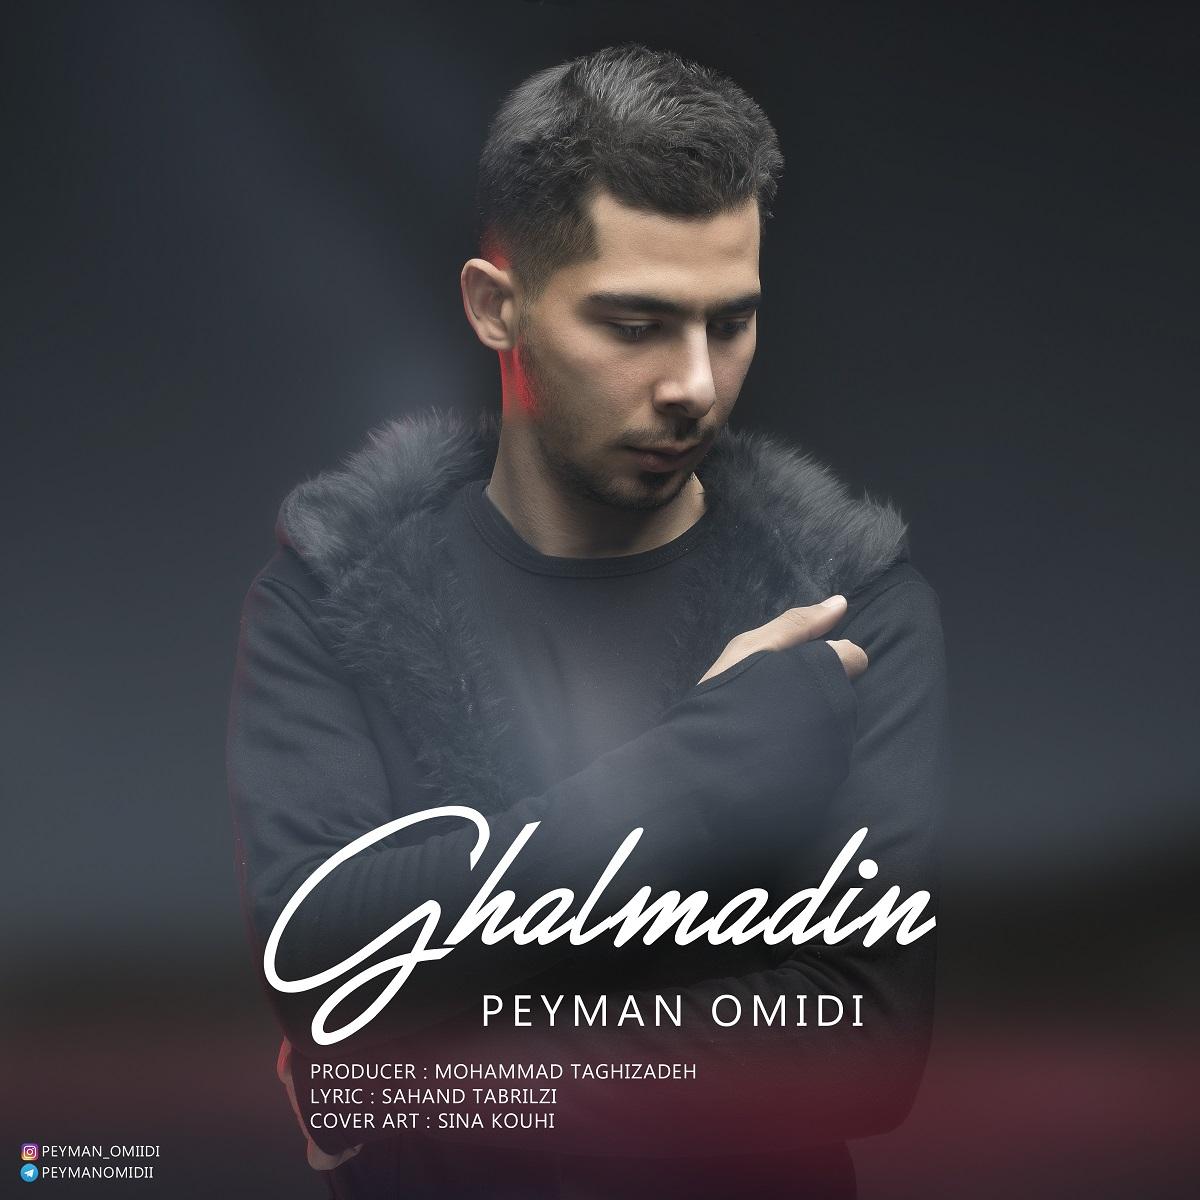 Peyman Omidi - Galmadin